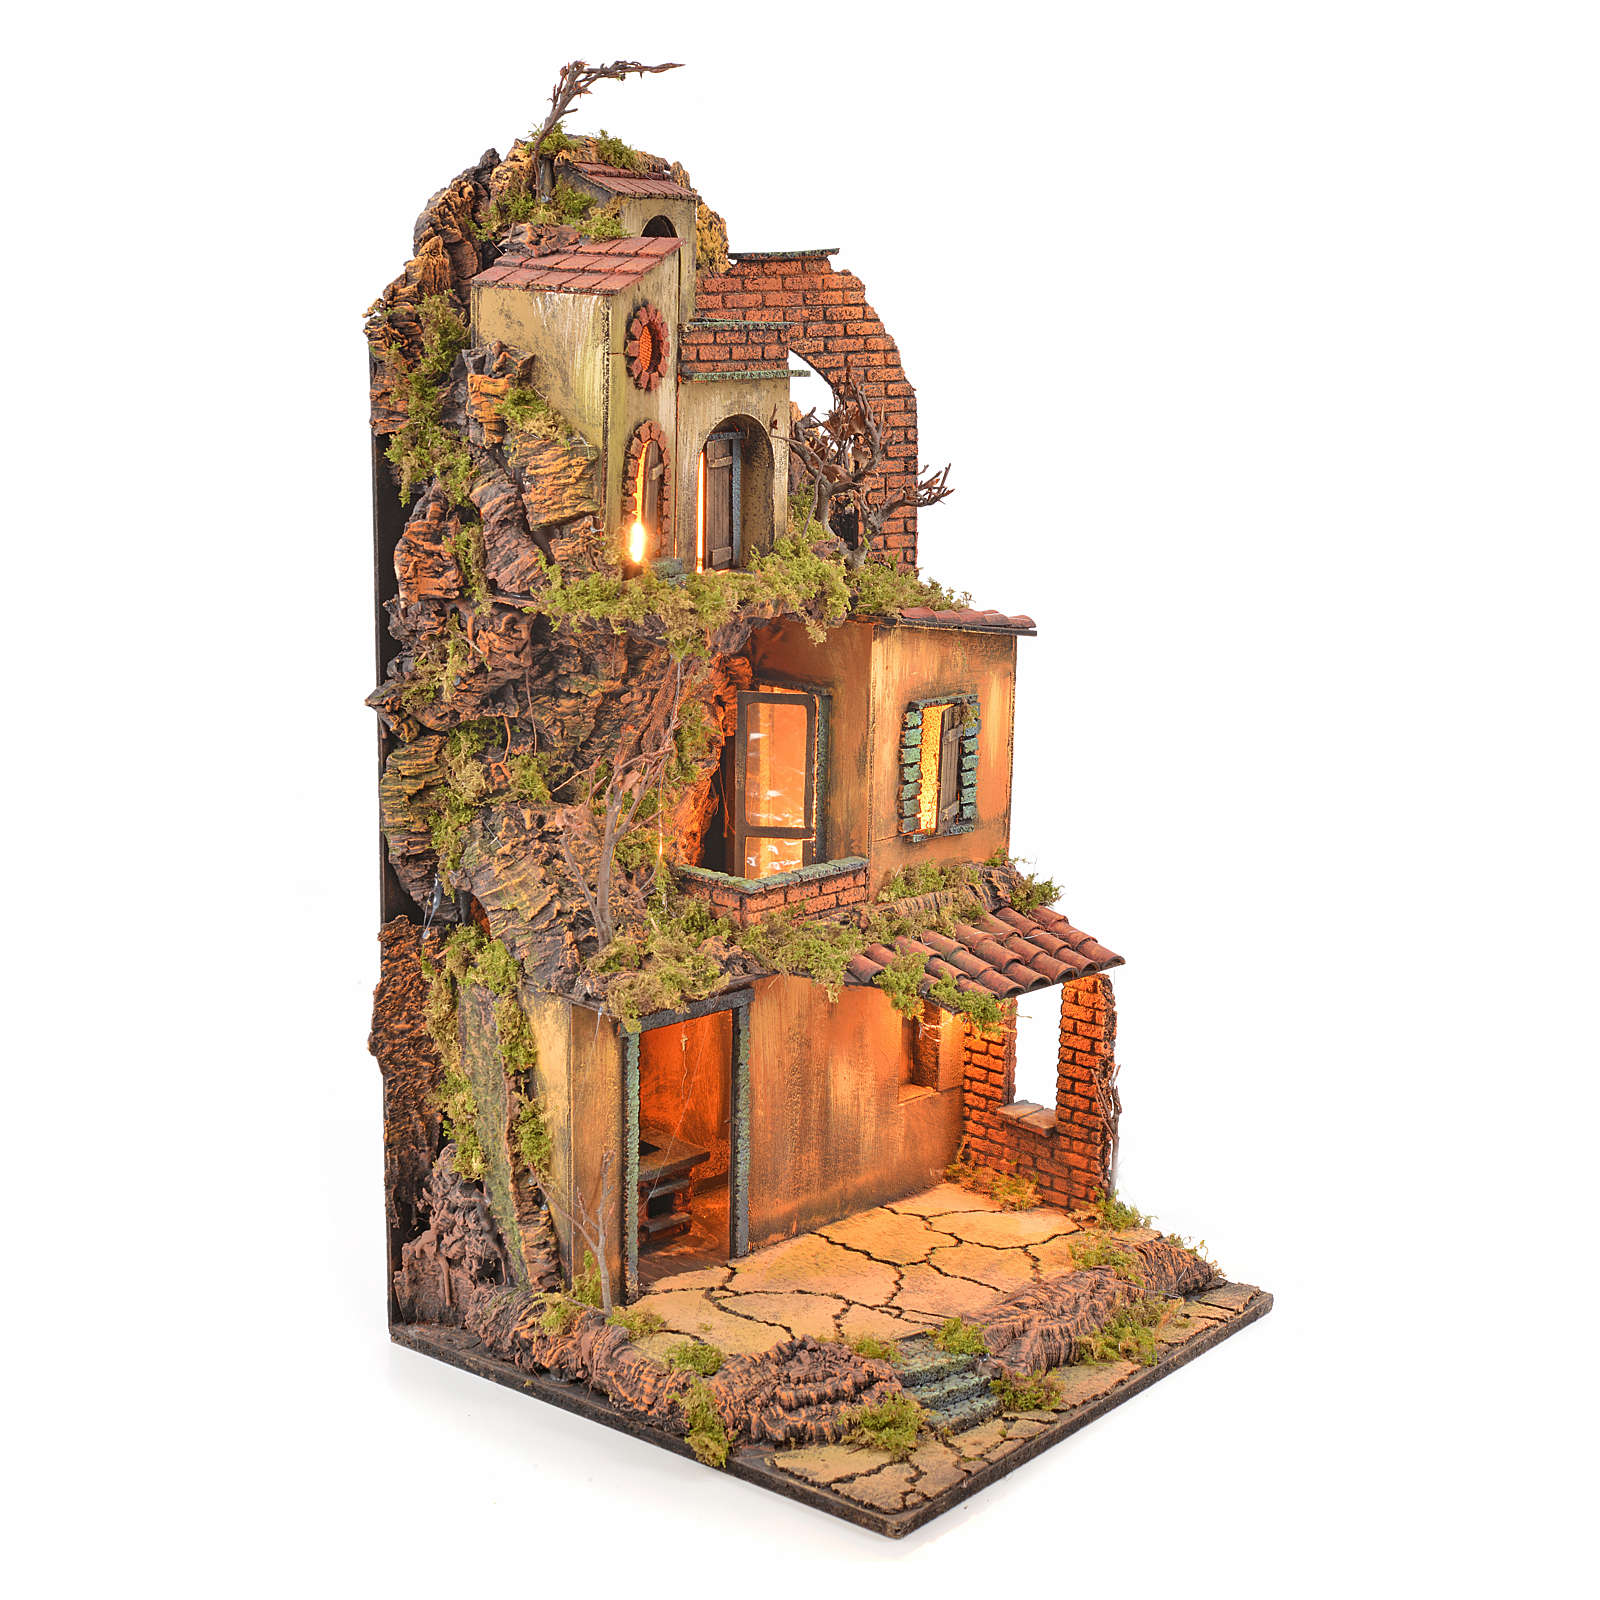 Borgo presepe napoletano stile 700 torre forno luce 65x45x37 4